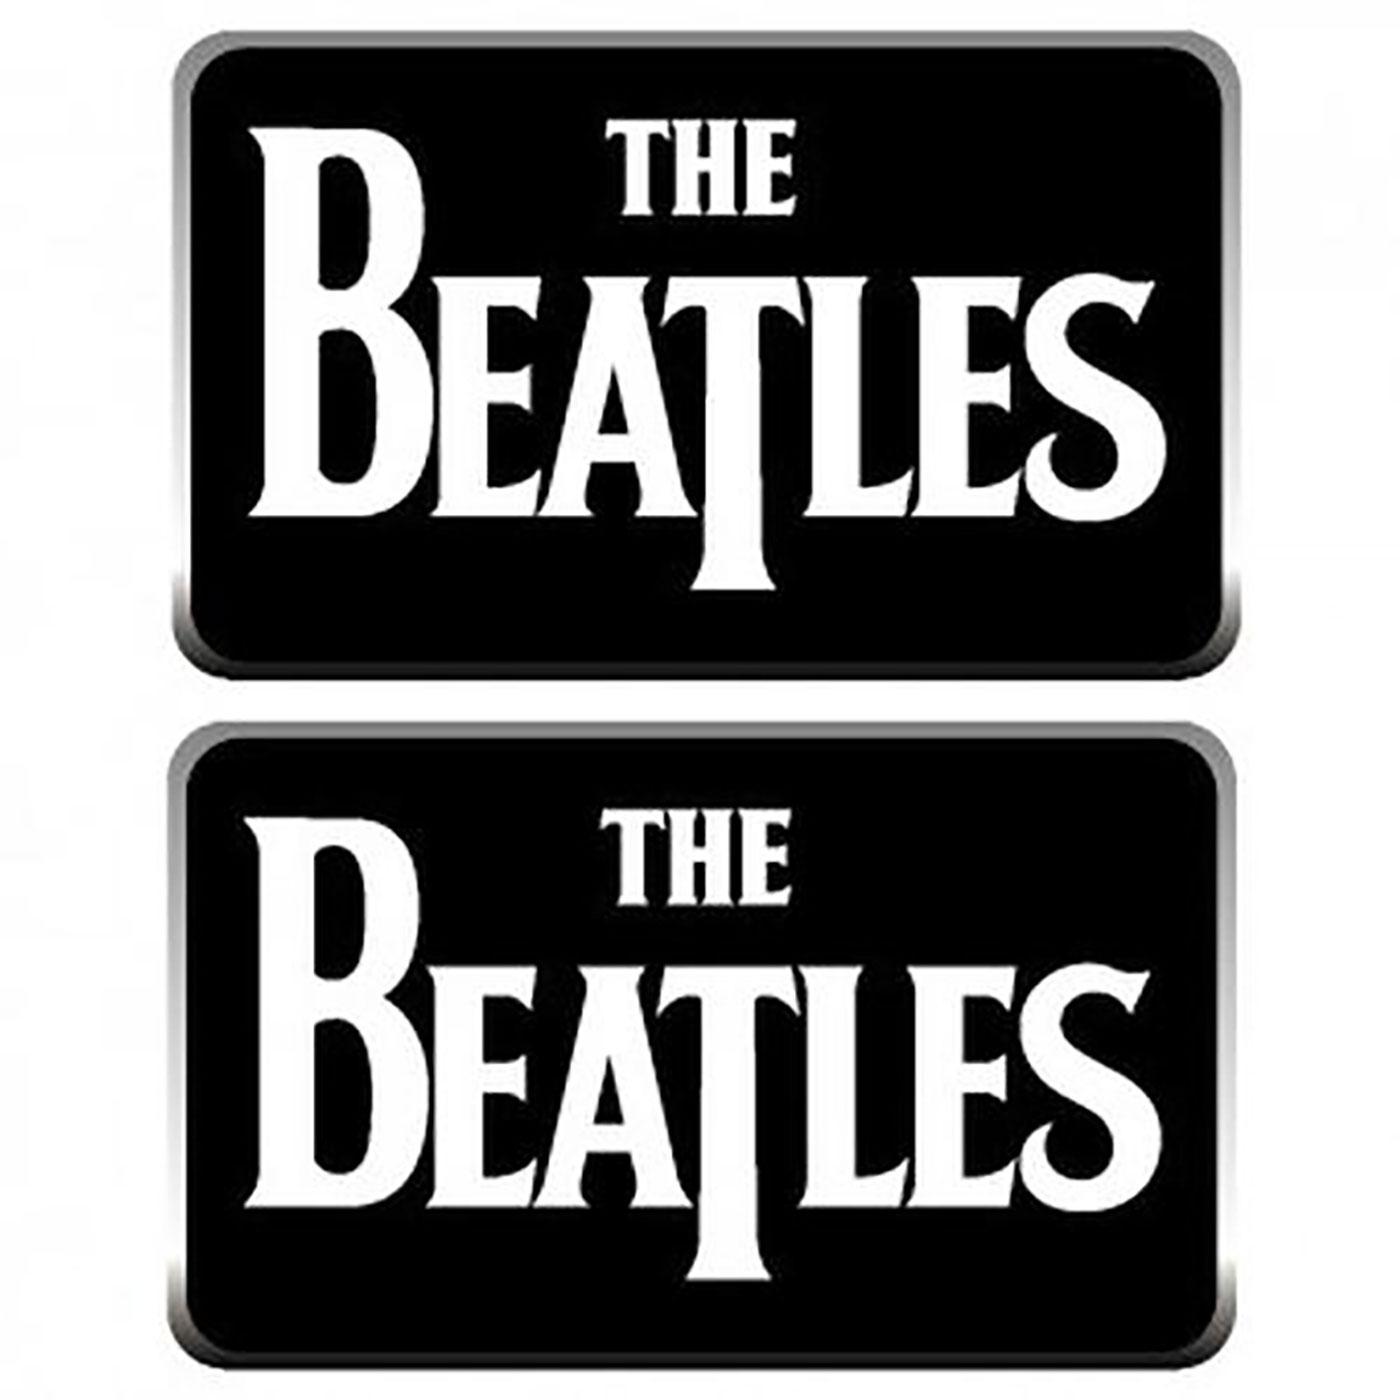 'All You Need Is Cufflinks' - Beatles Cufflinks